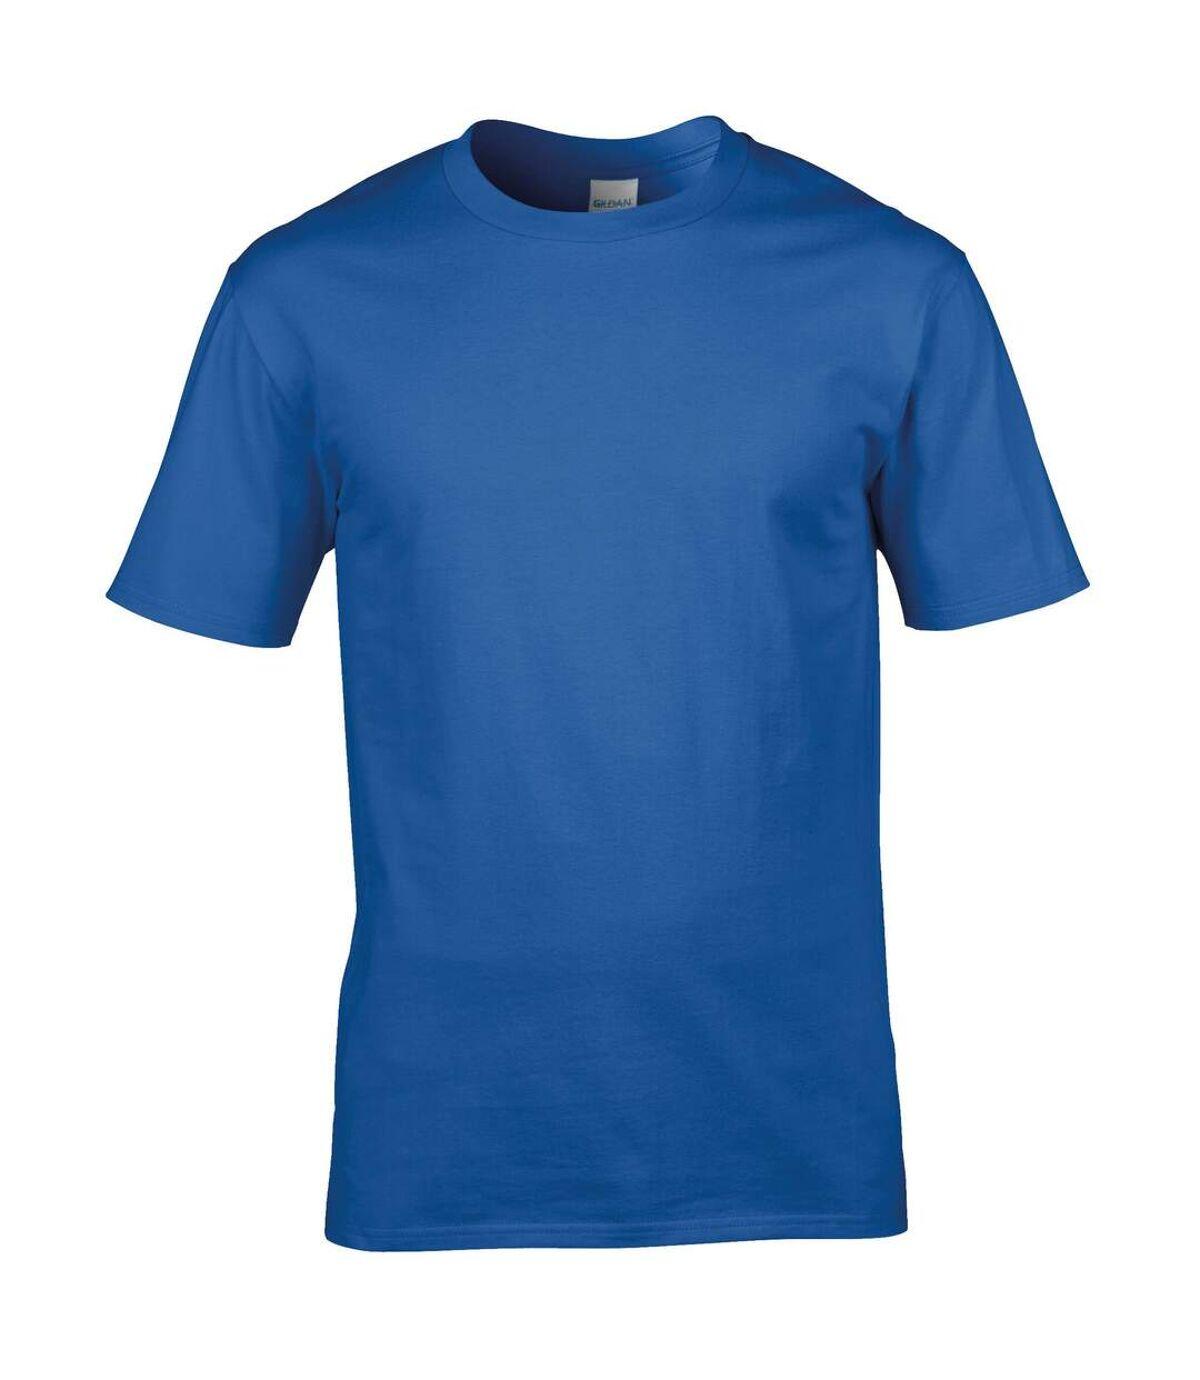 Gildan Mens Premium Cotton T-Shirt (Sport Grey) - UTPC3231